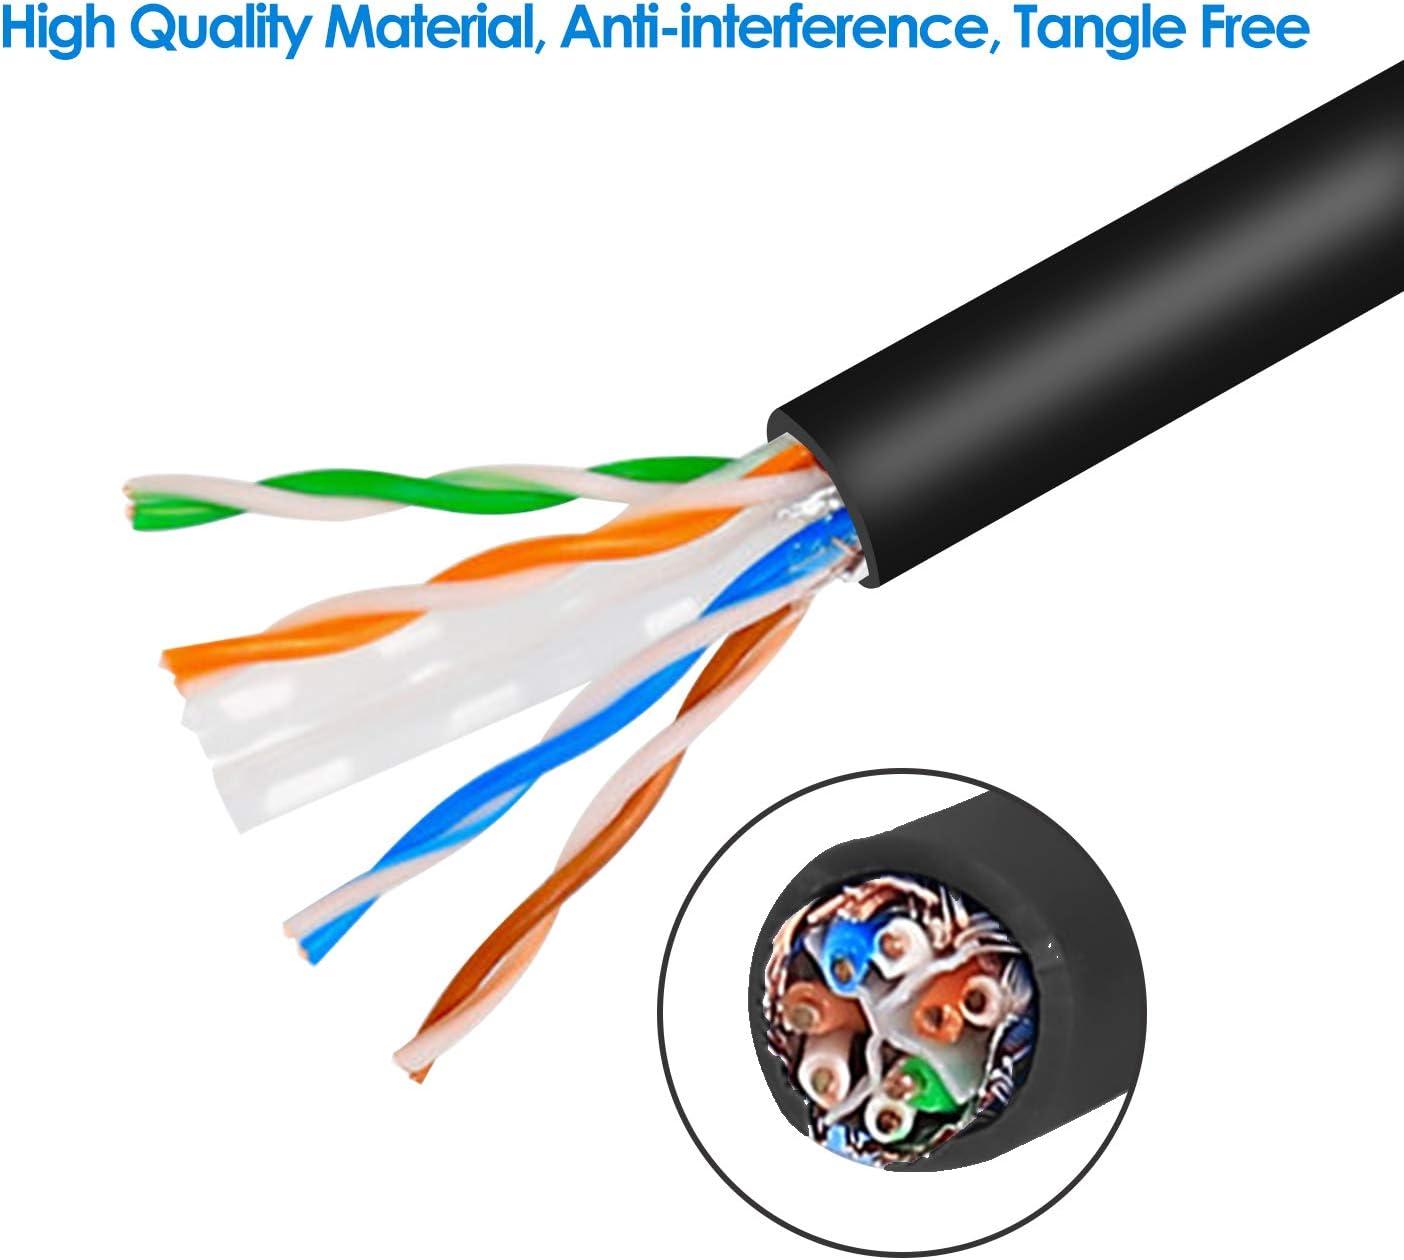 ShineBear Hot Cat5e RJ45 UTP Ethernet LAN Network Patch Cable Line Lead 5M Cable Length: 5m